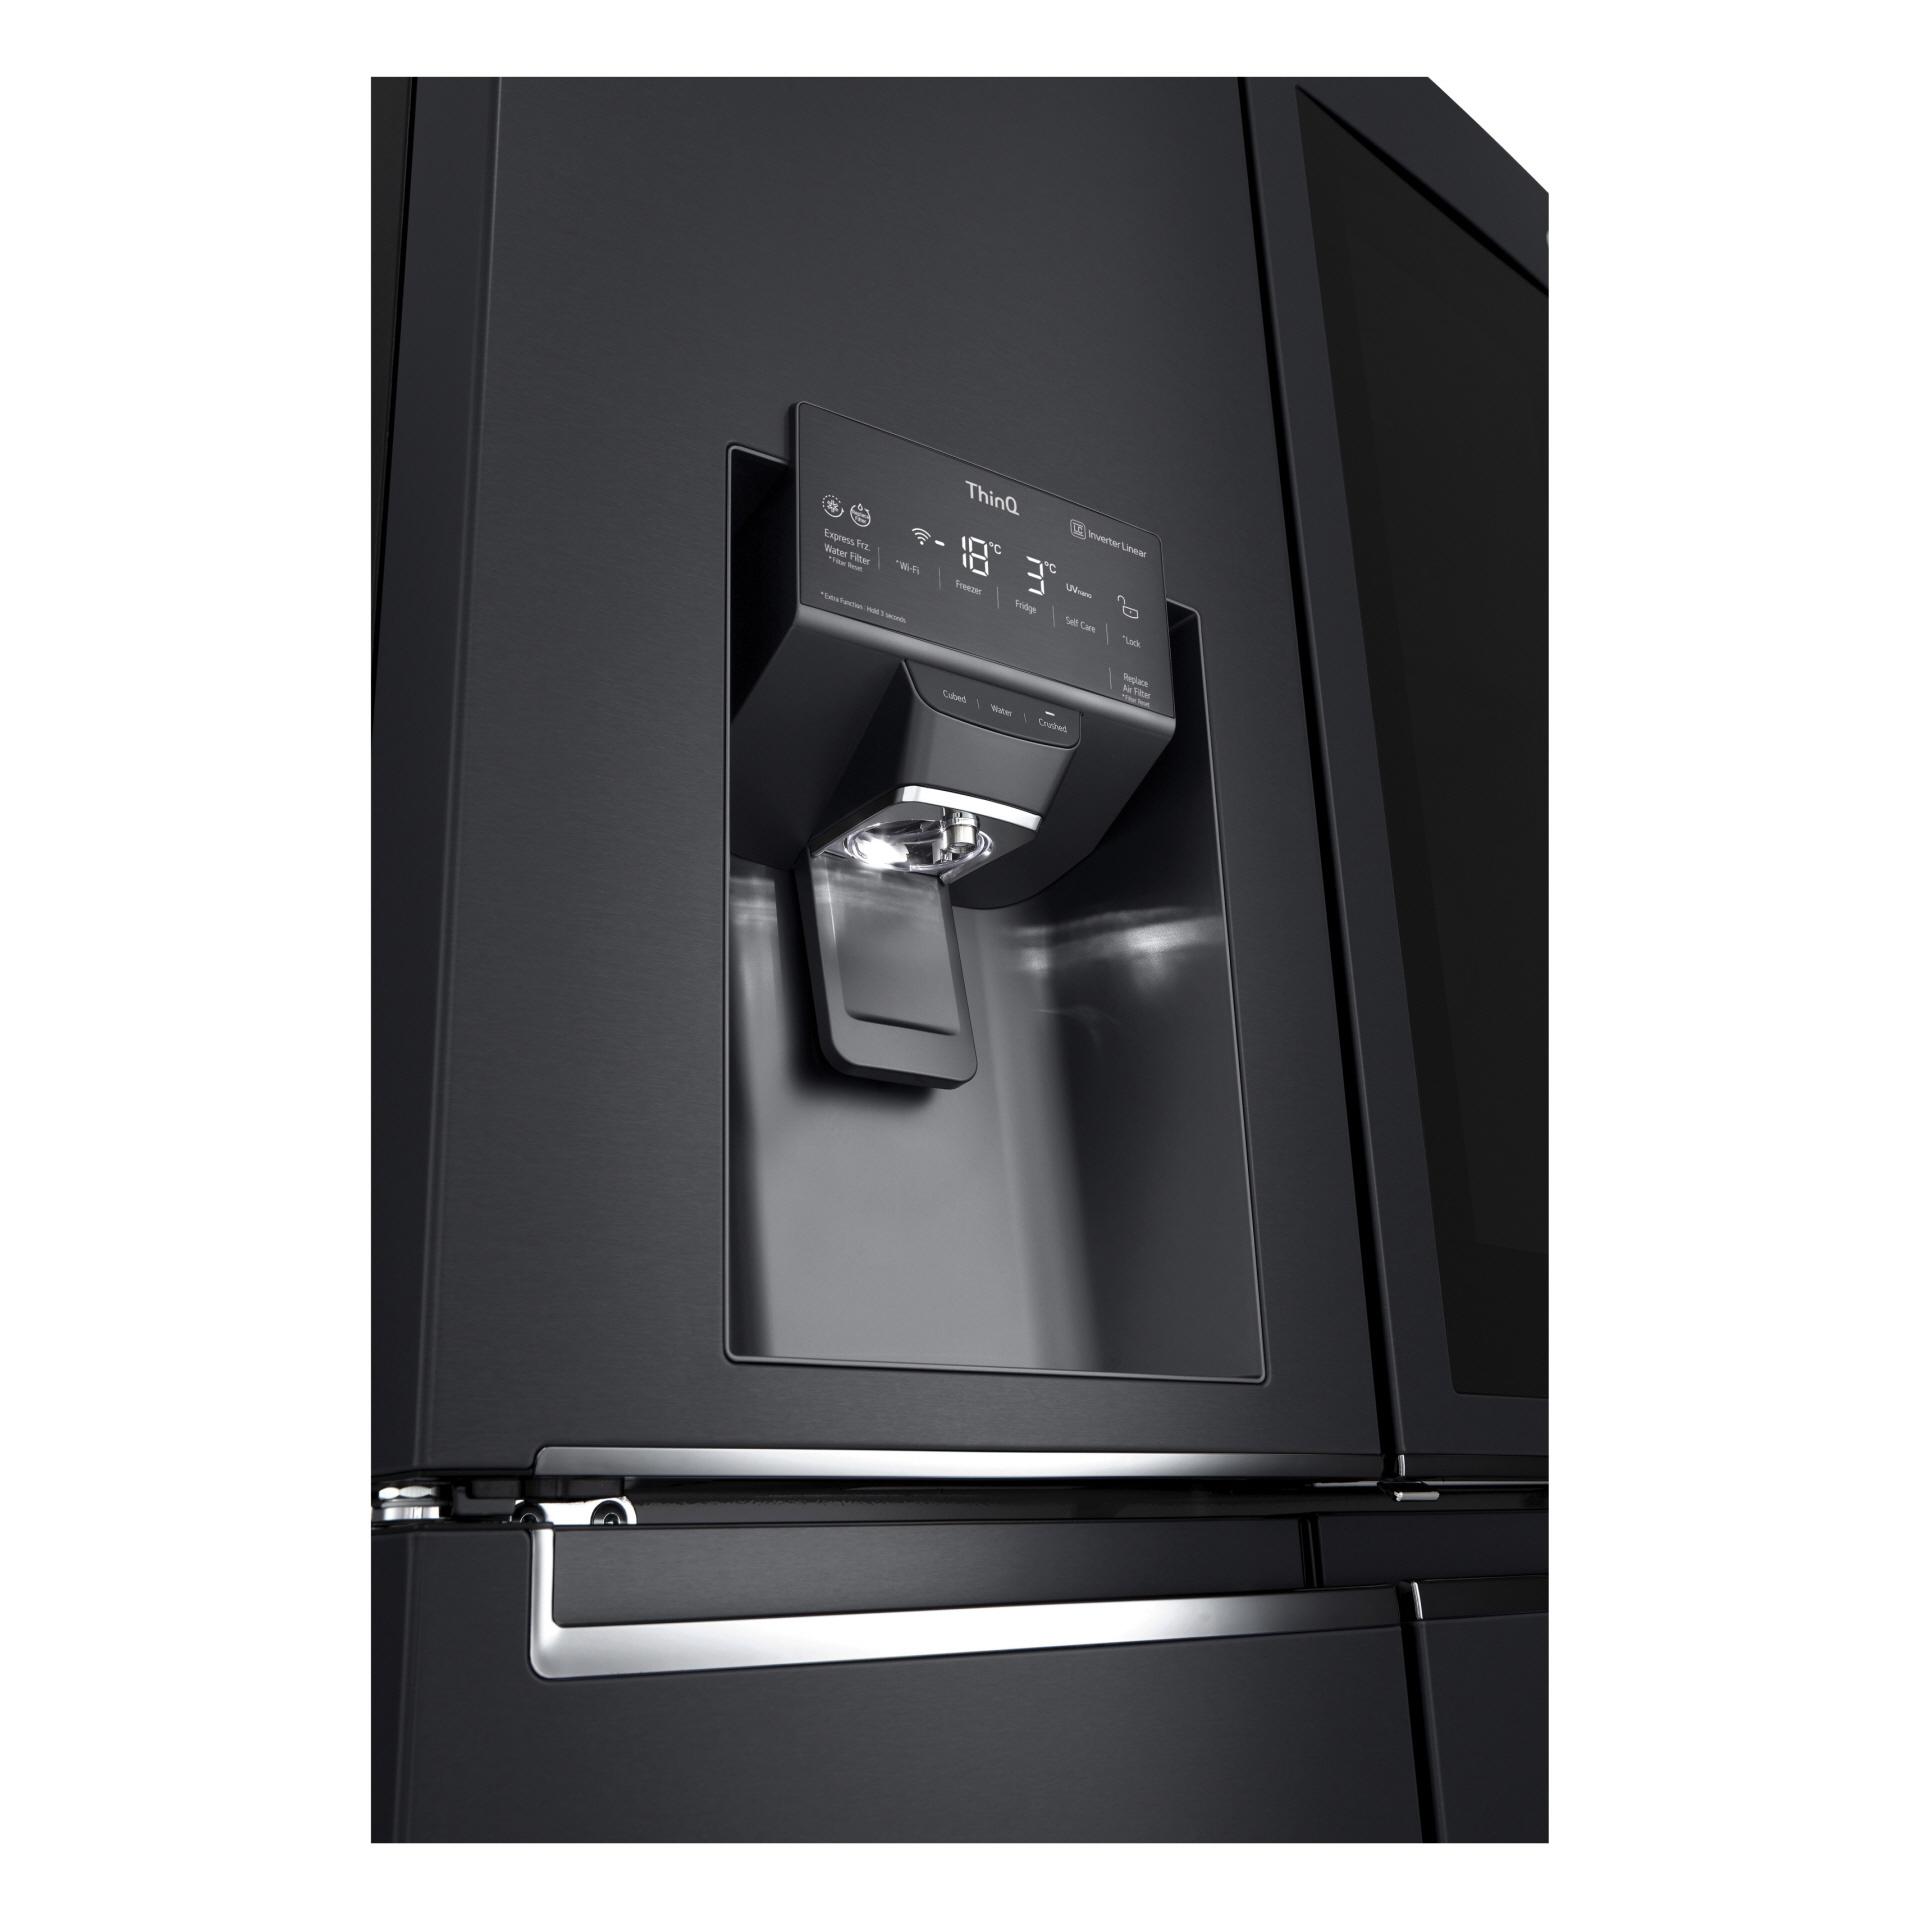 frigorifico inteligente LG con UVnano